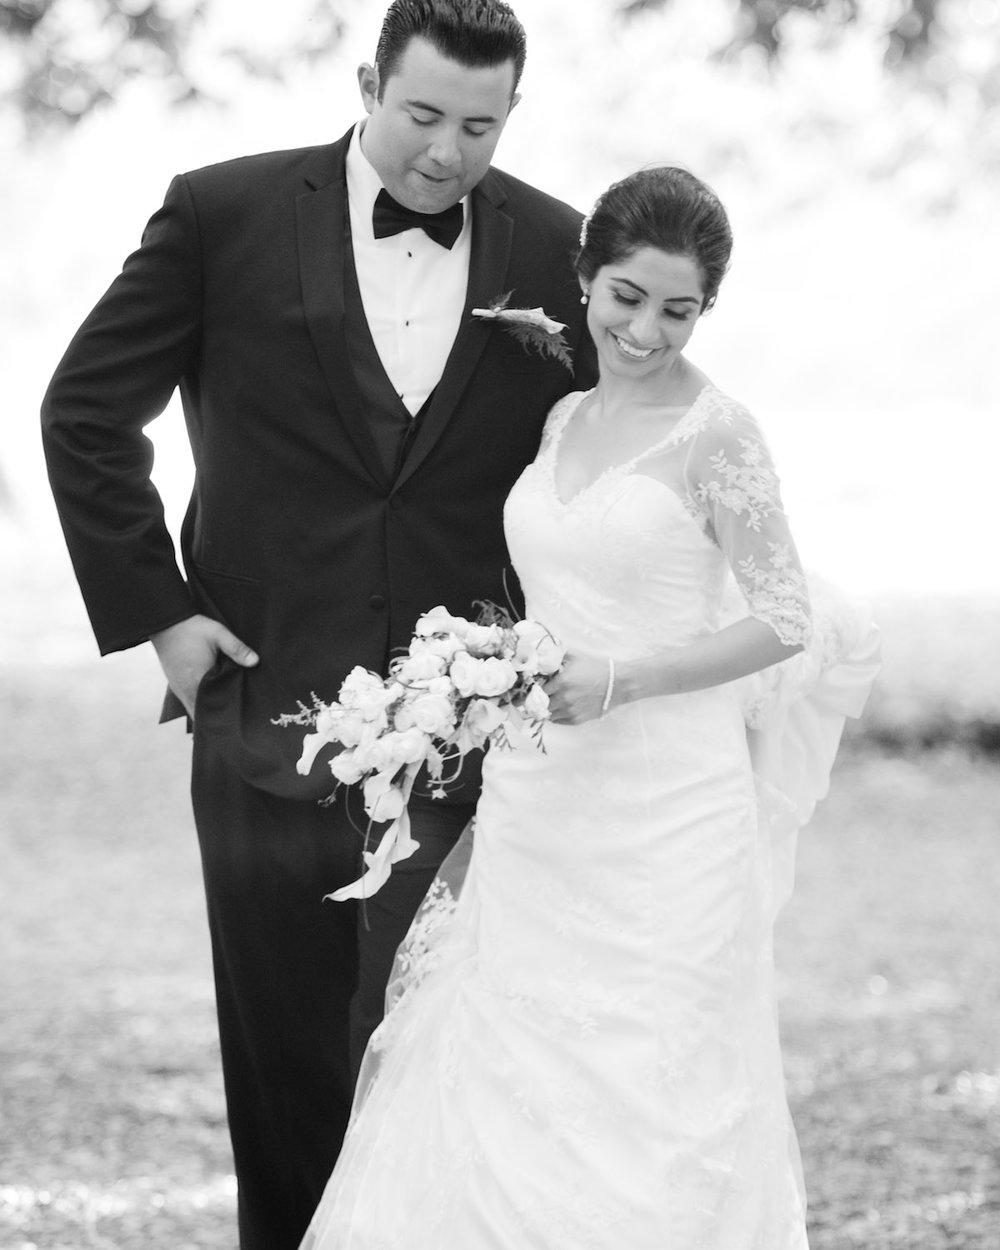 oc-wedding-michal-pfeil-19.jpg